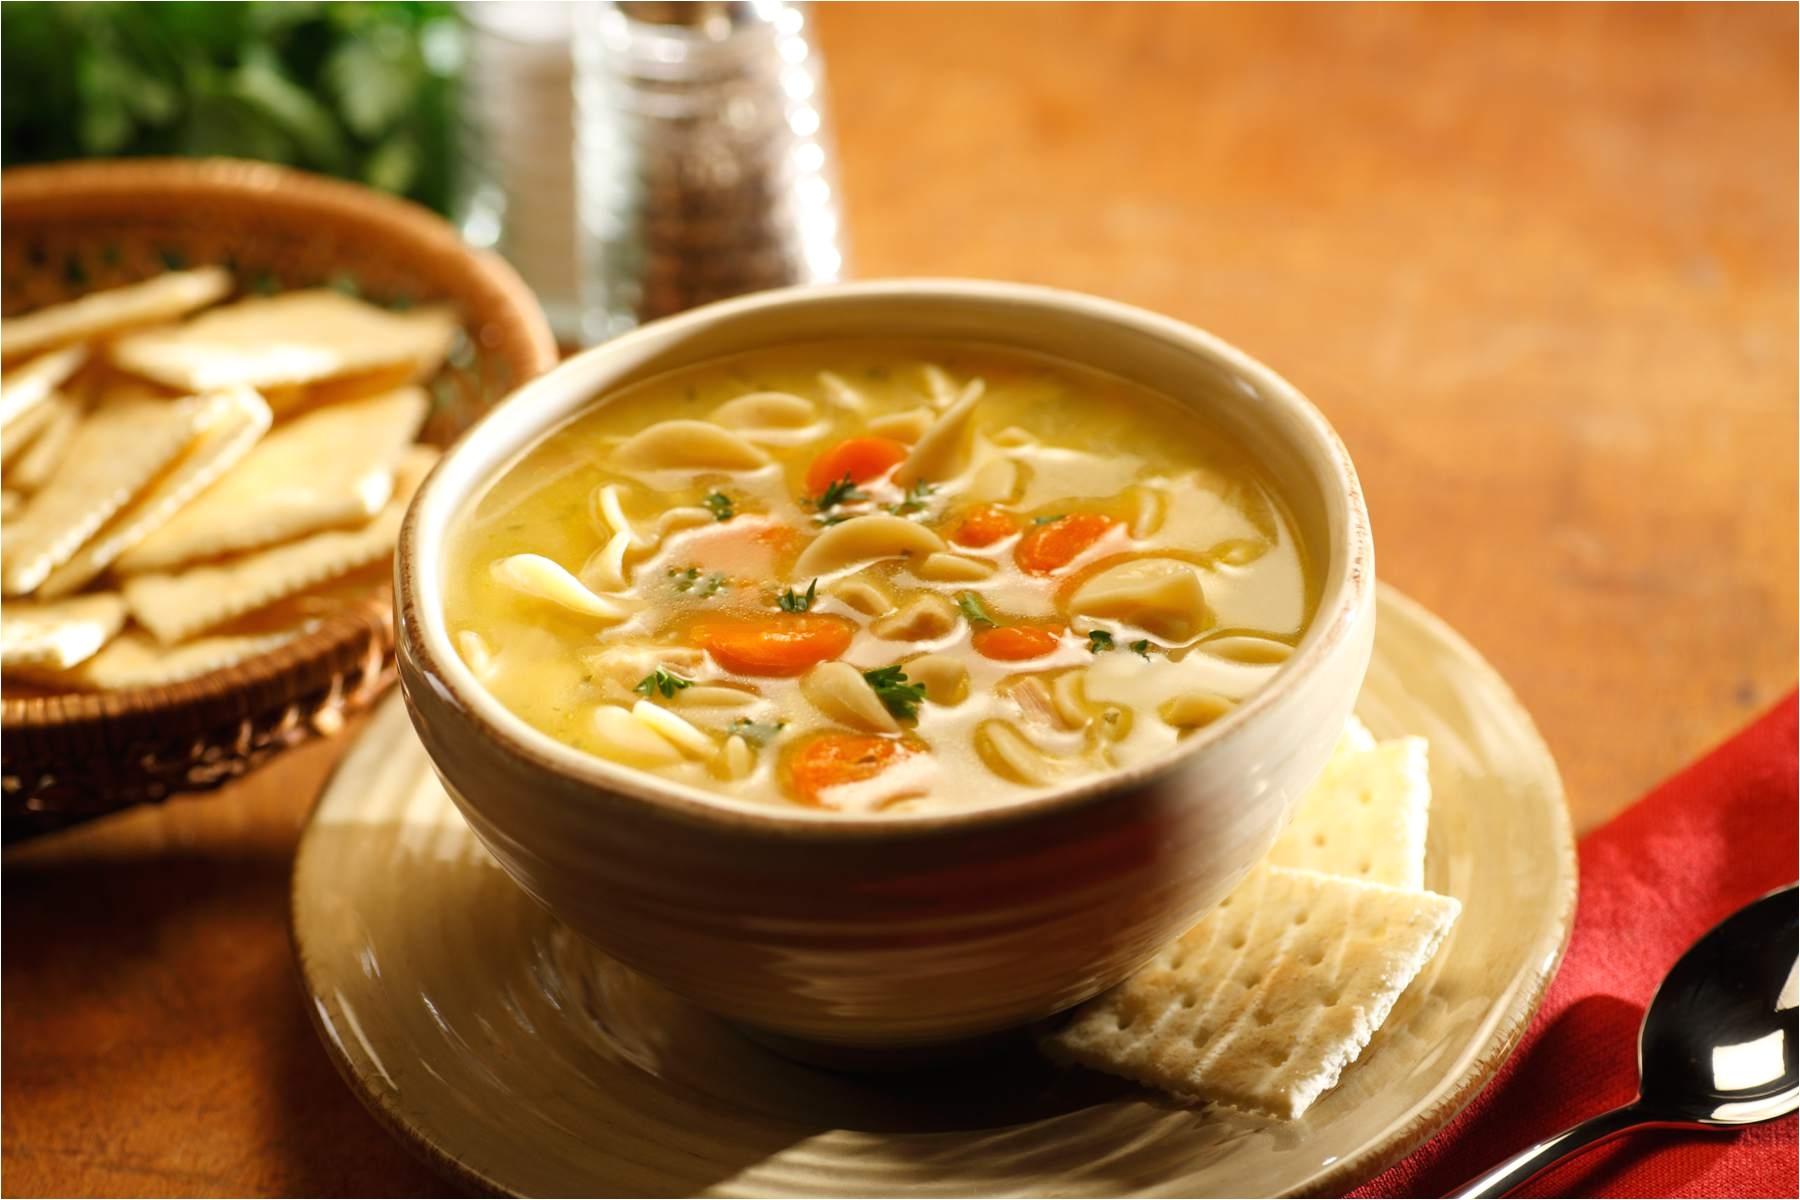 Progresso Light Chicken Noodle soup Heartburn Friendly Chicken Noodle soup Recipe